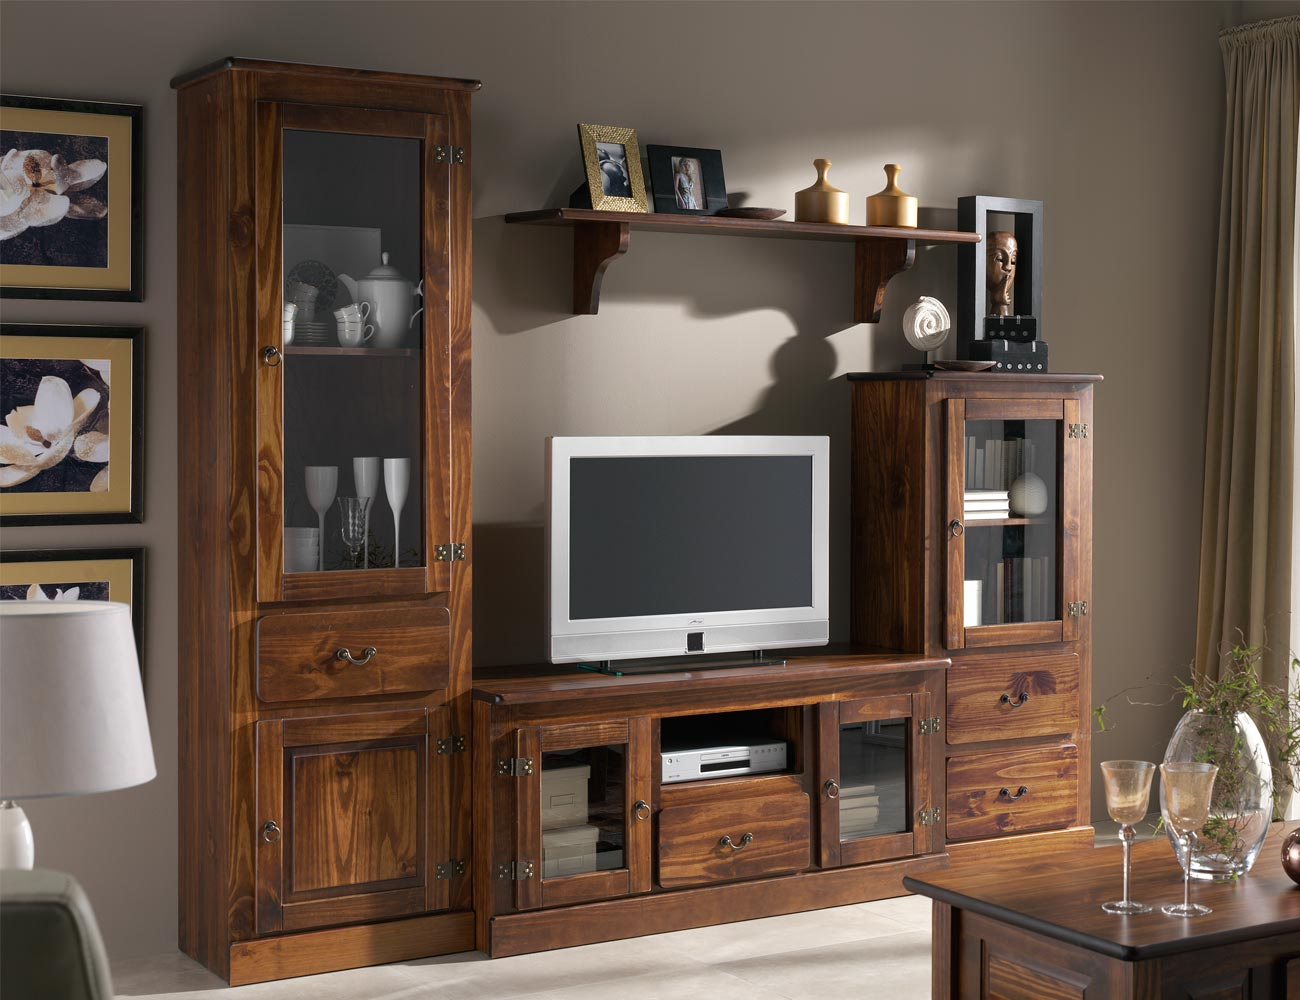 Composicion2 mueble salon comedor1